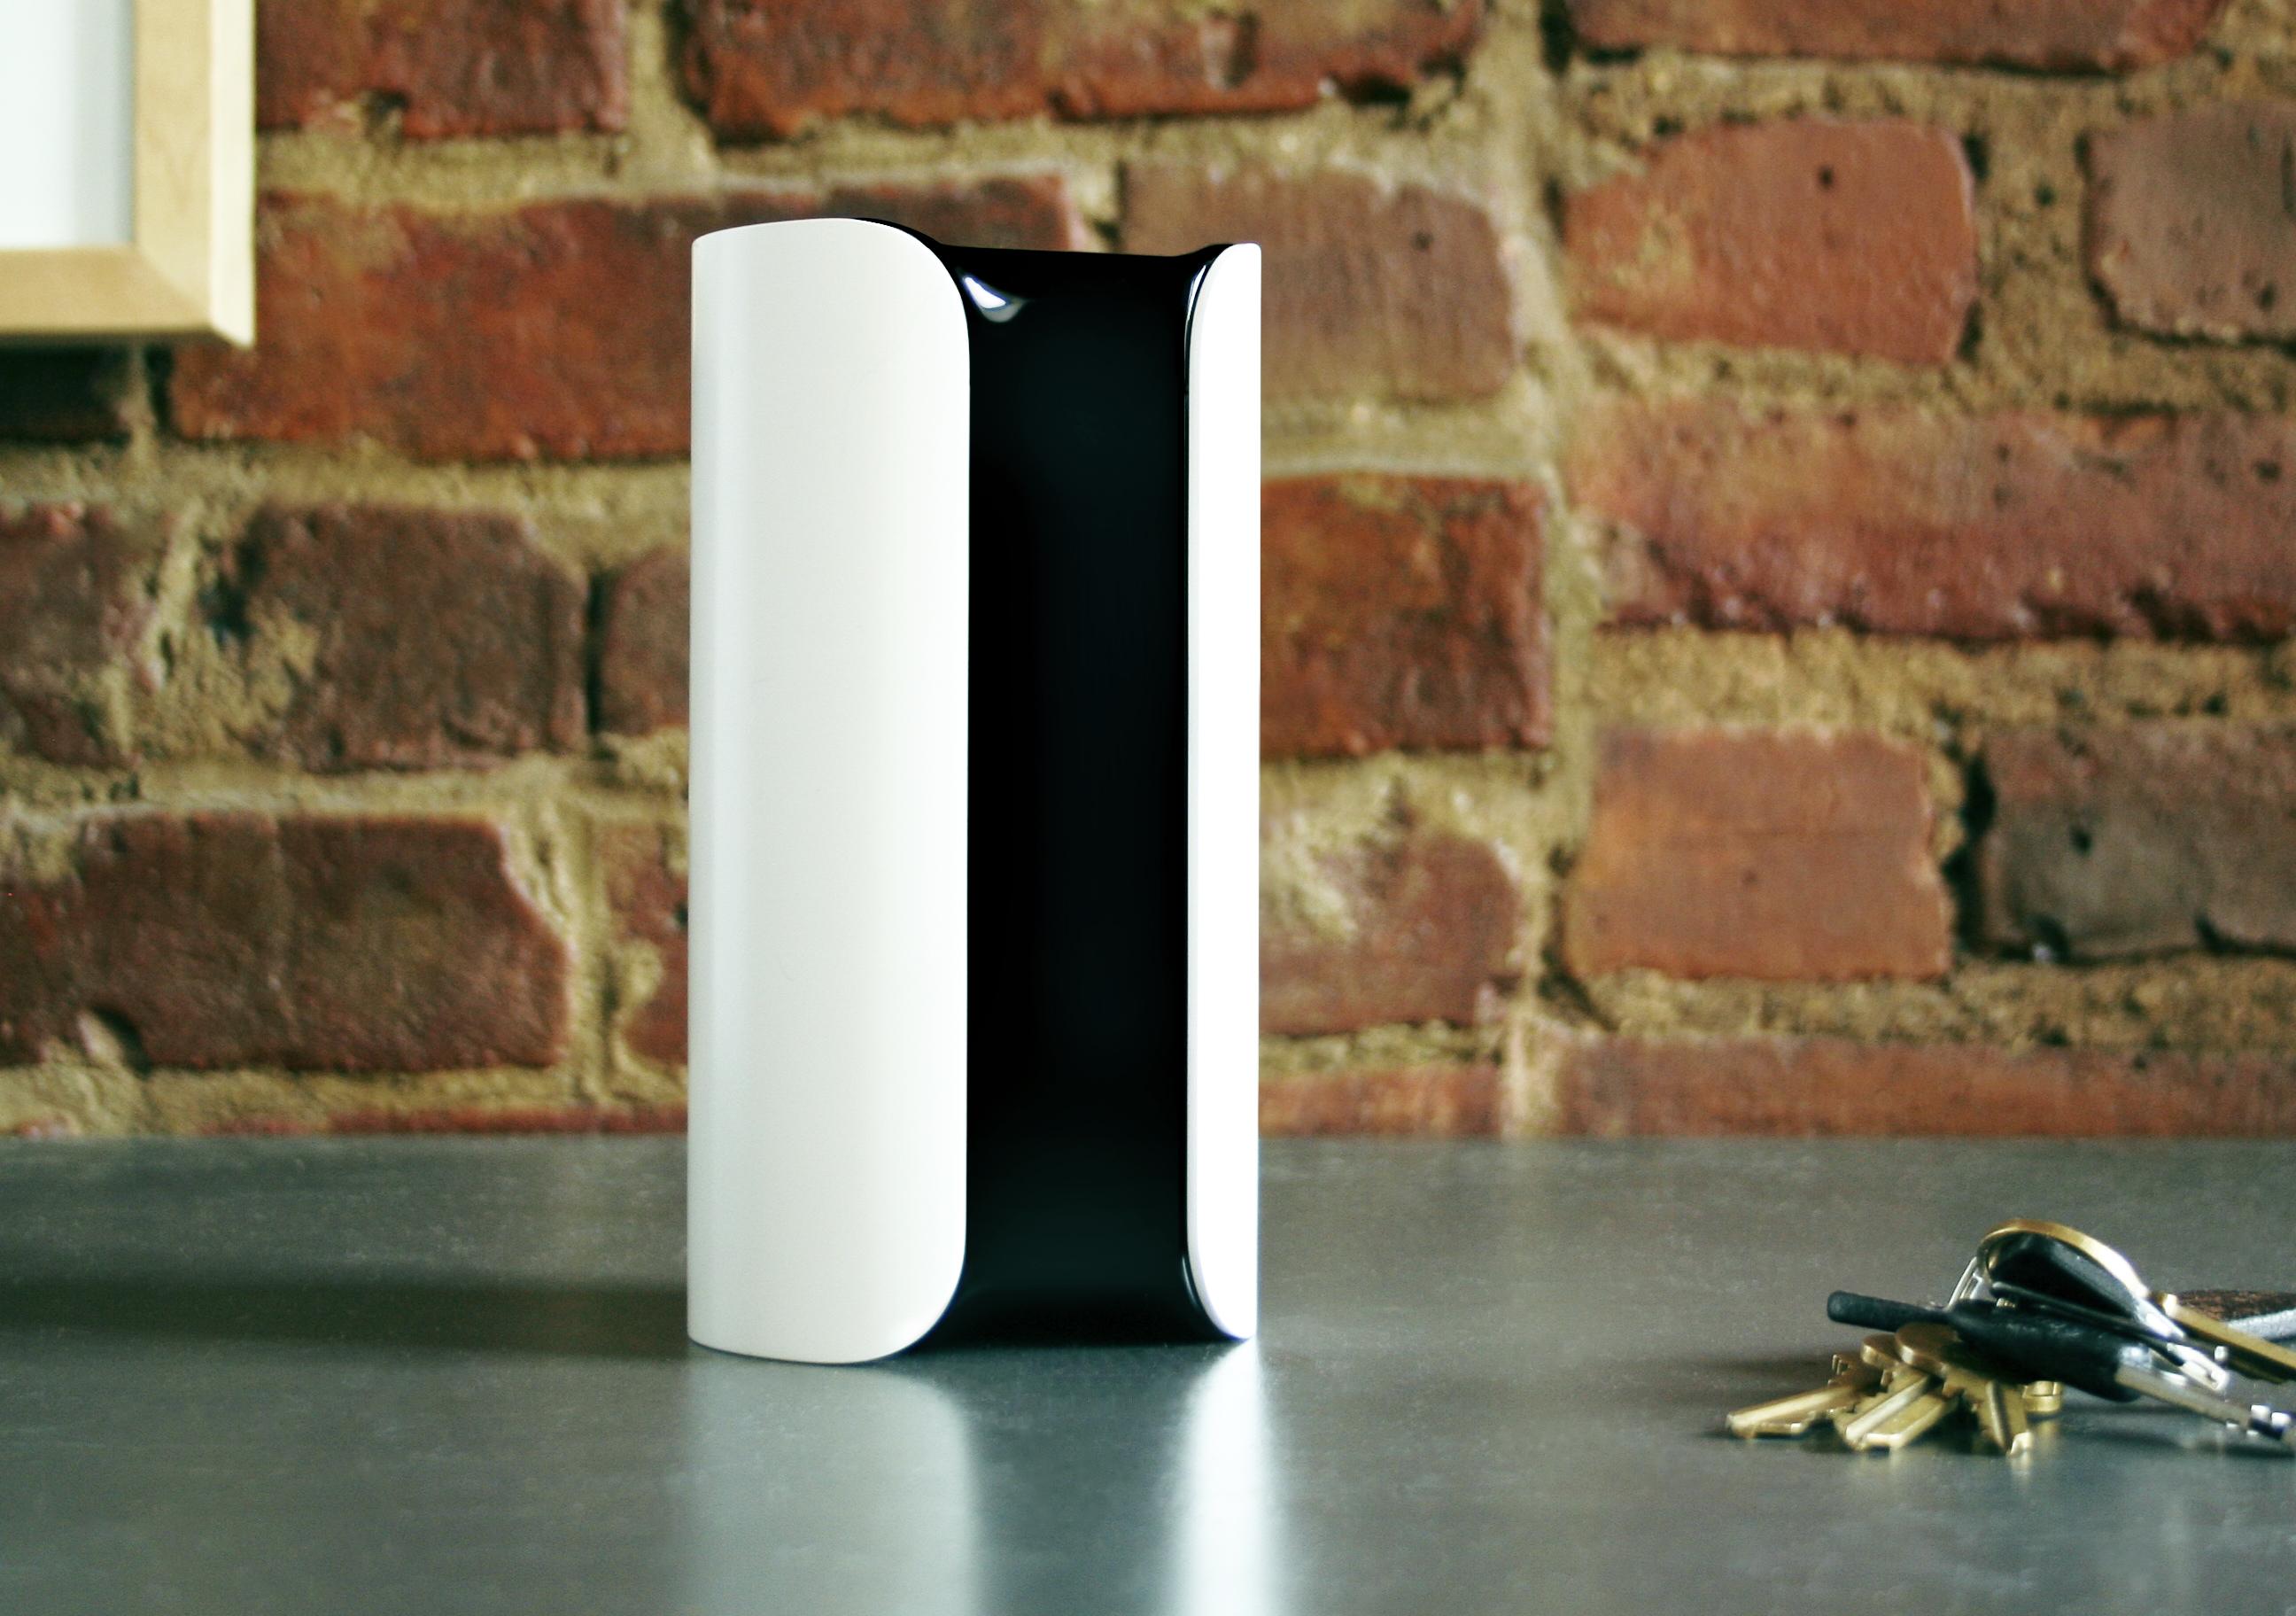 Canary: умная система безопасности для дома